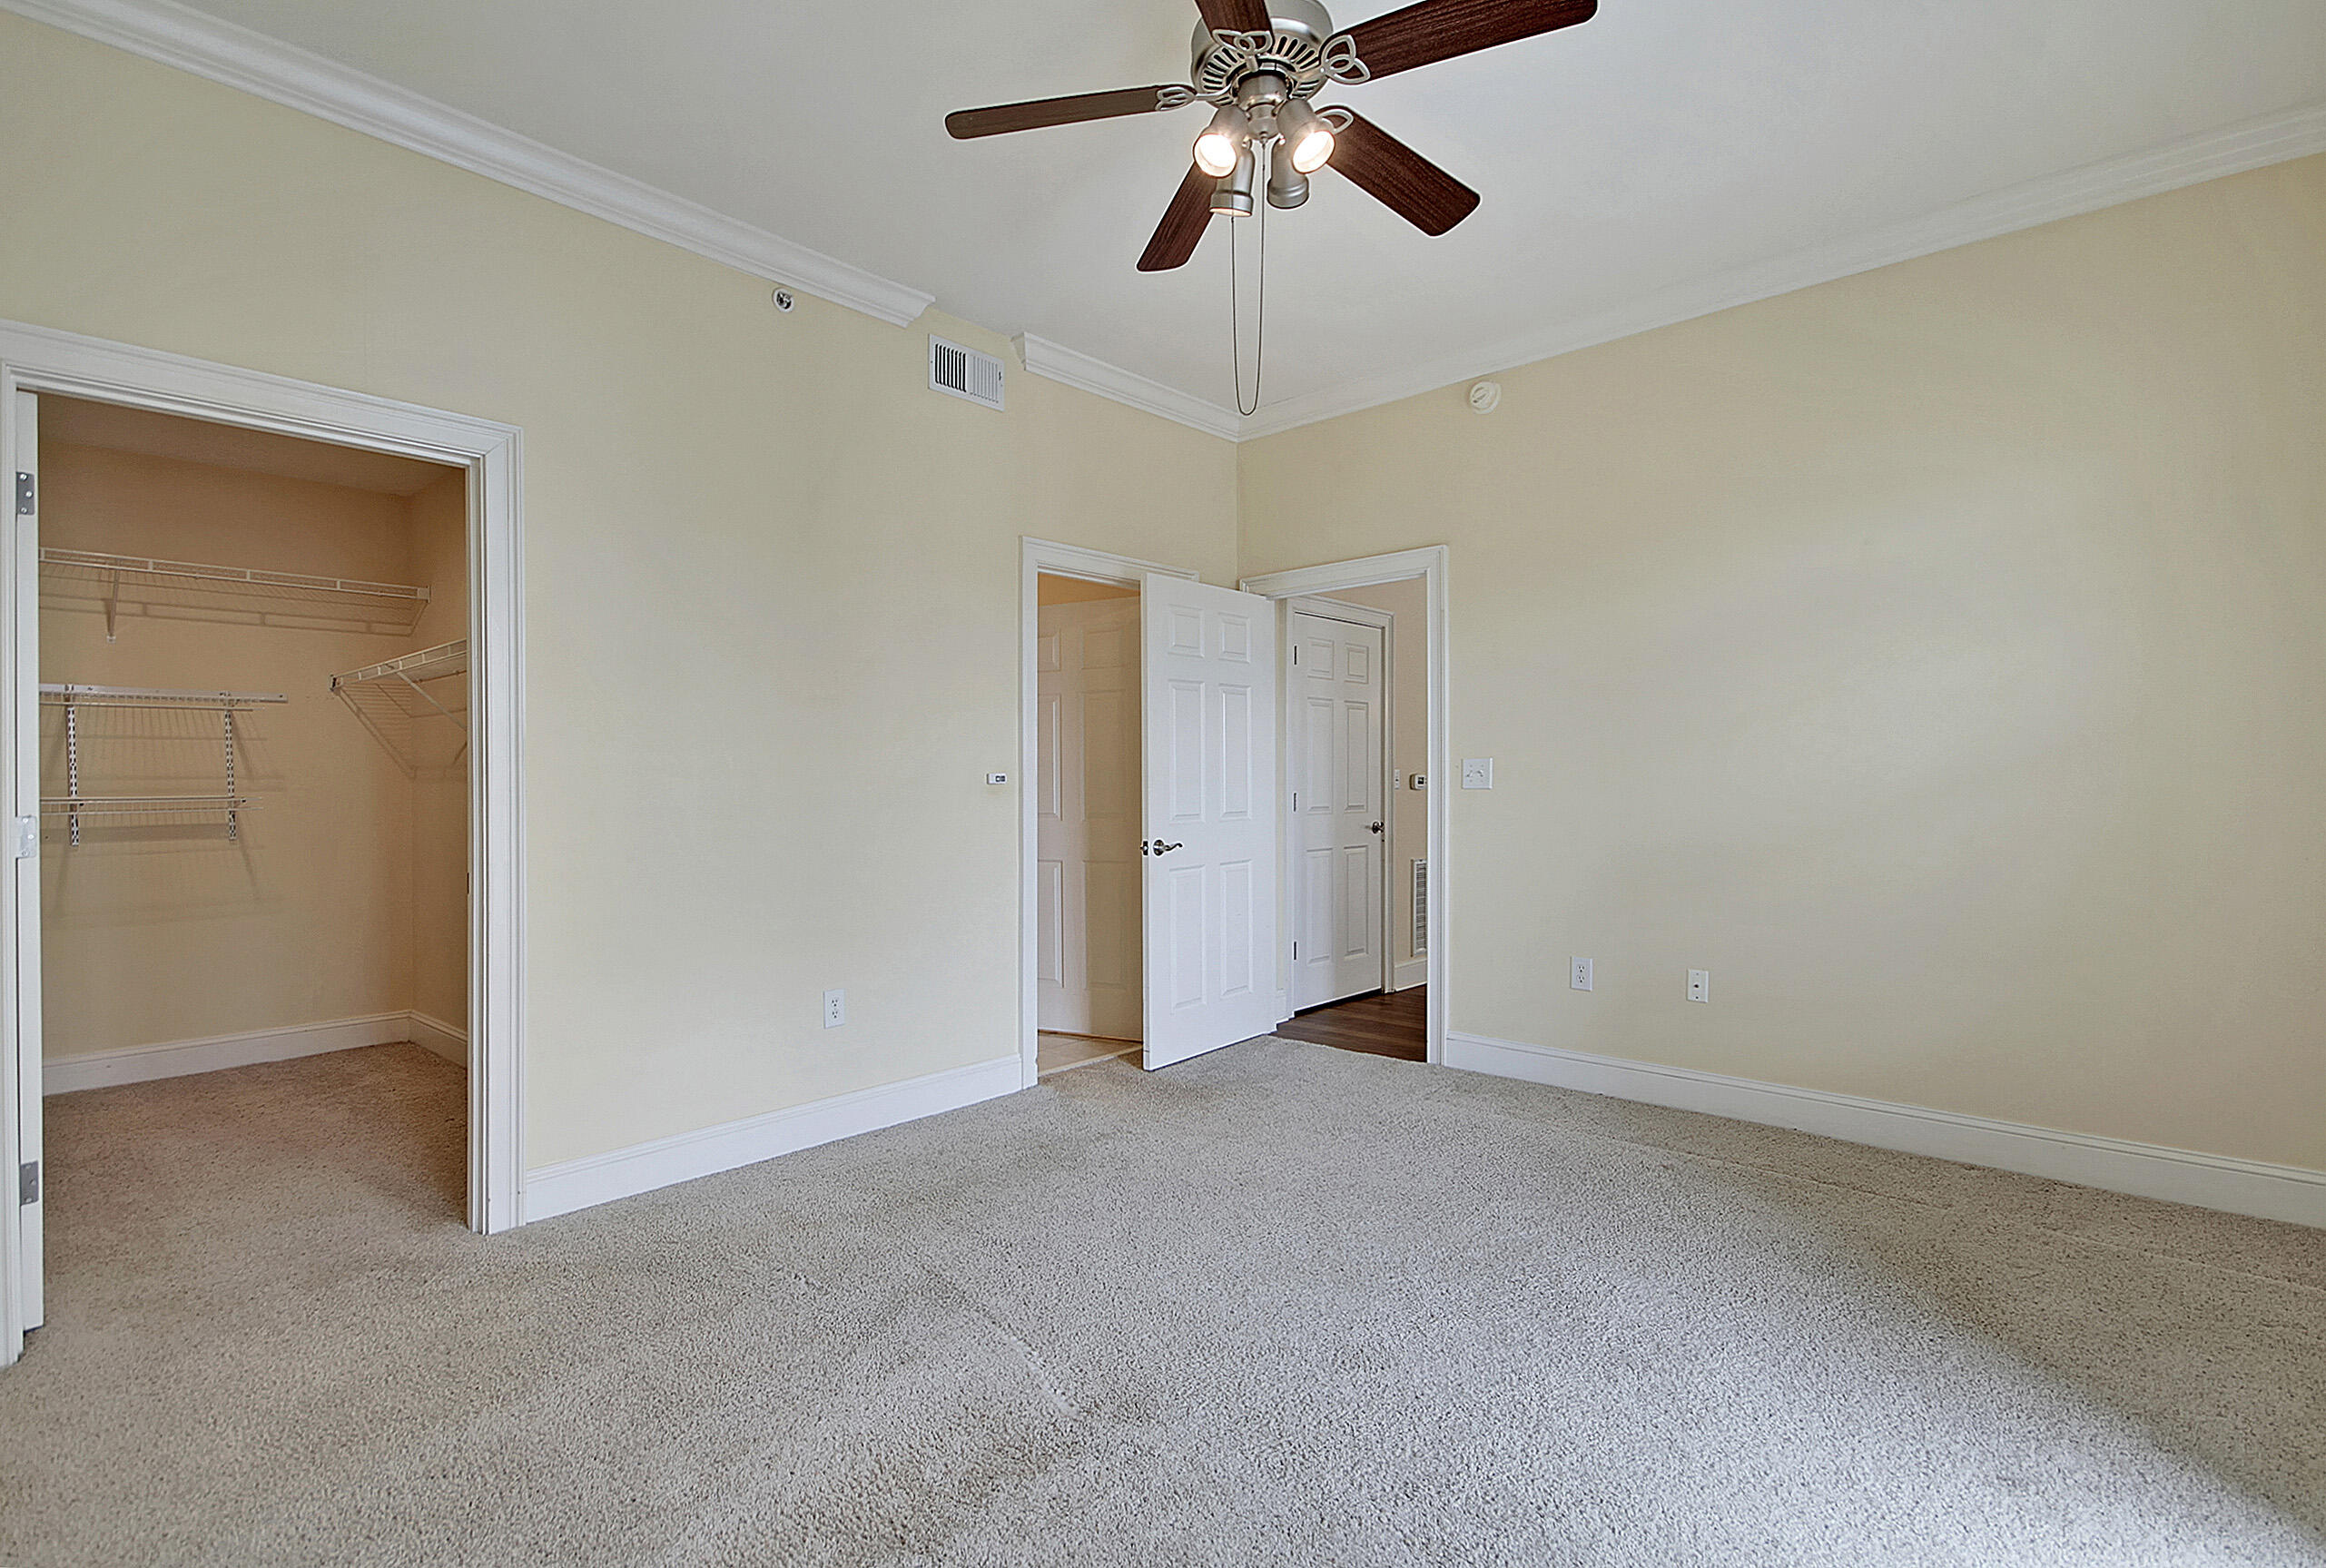 Albemarle Condos For Sale - 498 Albemarle, Charleston, SC - 33